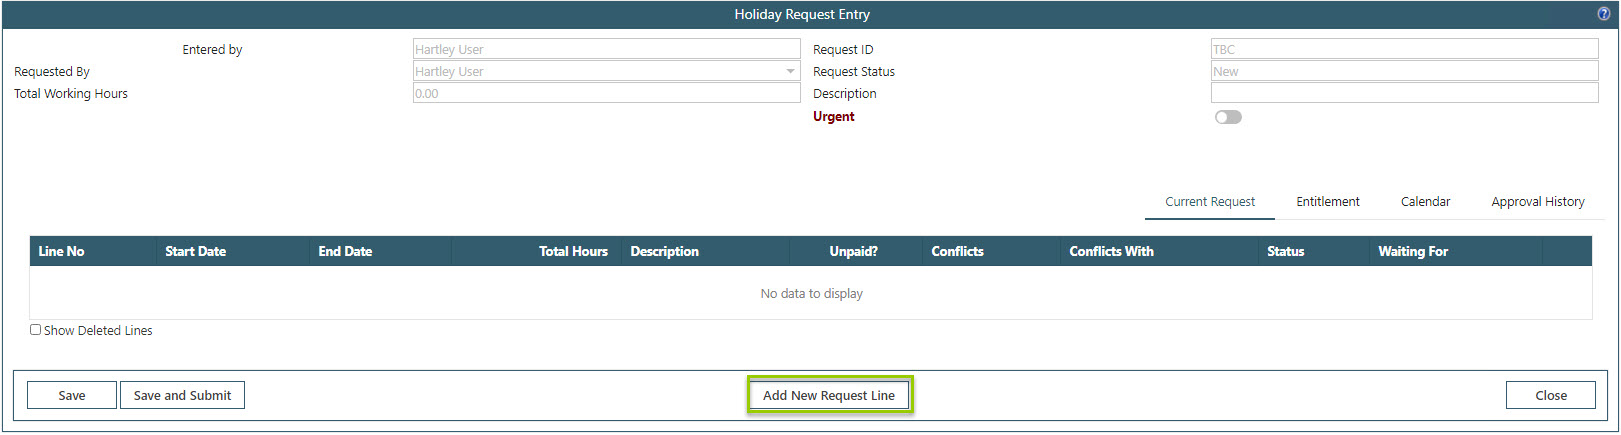 Sicon WAP Holidays Help and User Guide - WAP Holidays HUG Section 11.1 - Image 1